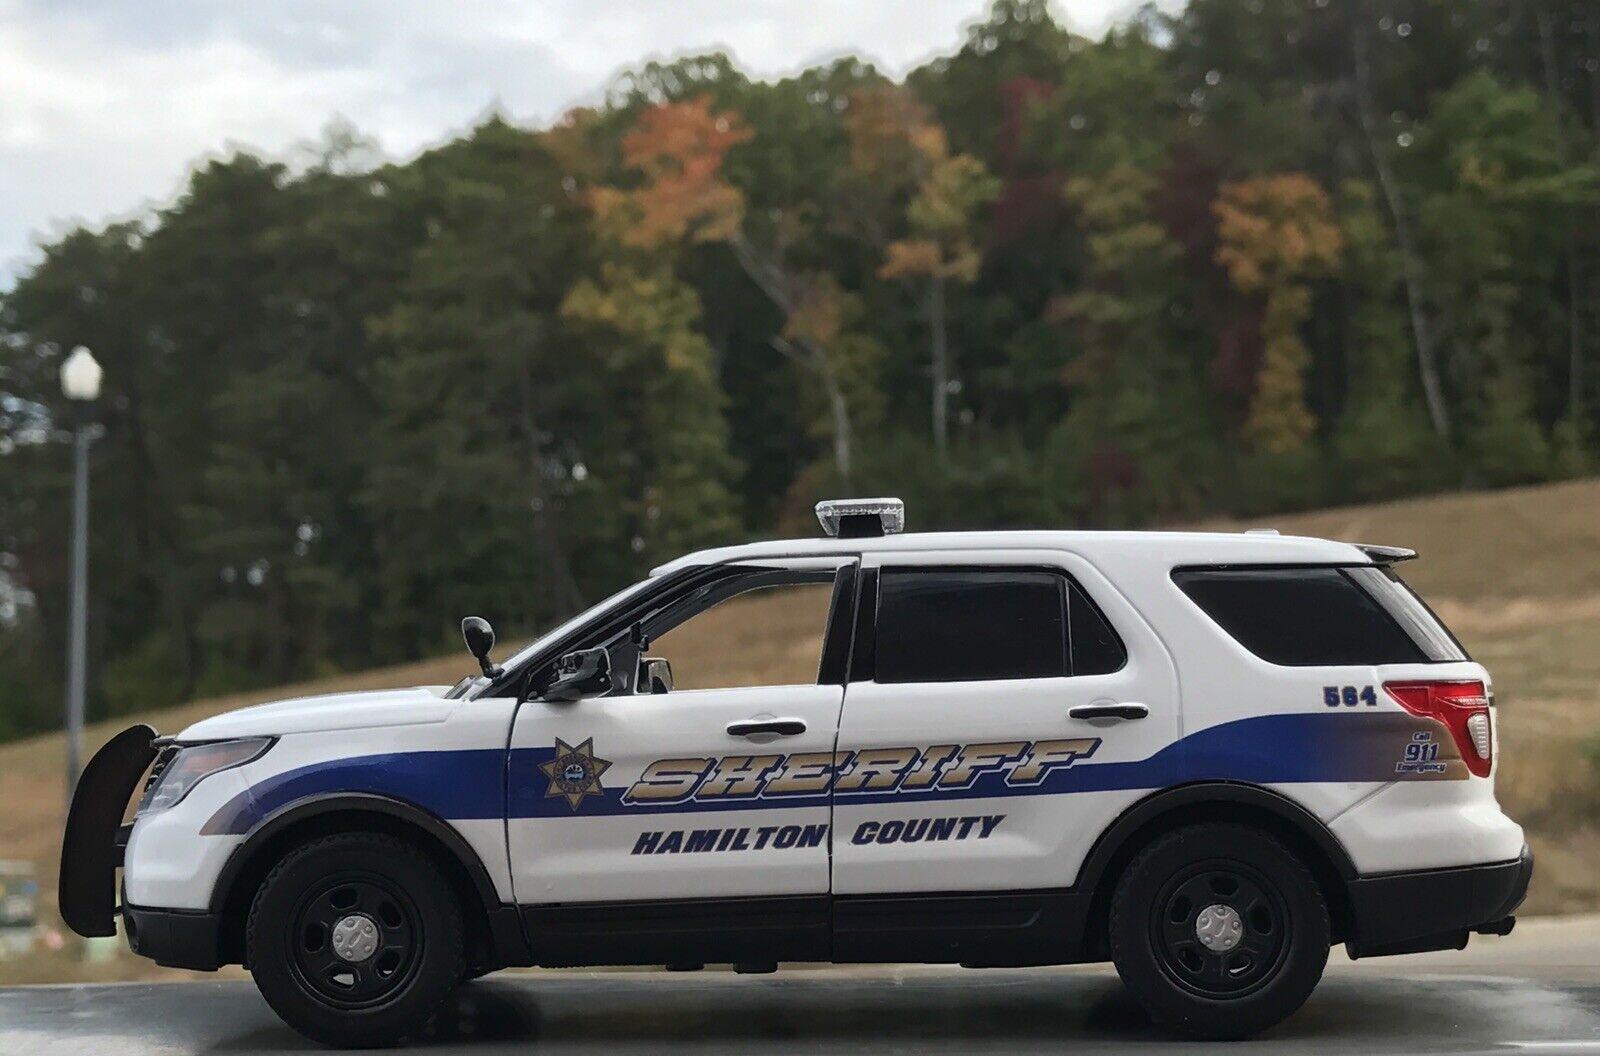 Hamilton County Tennessee custom sheriff's diecast SUV Motormax 1 24 scale